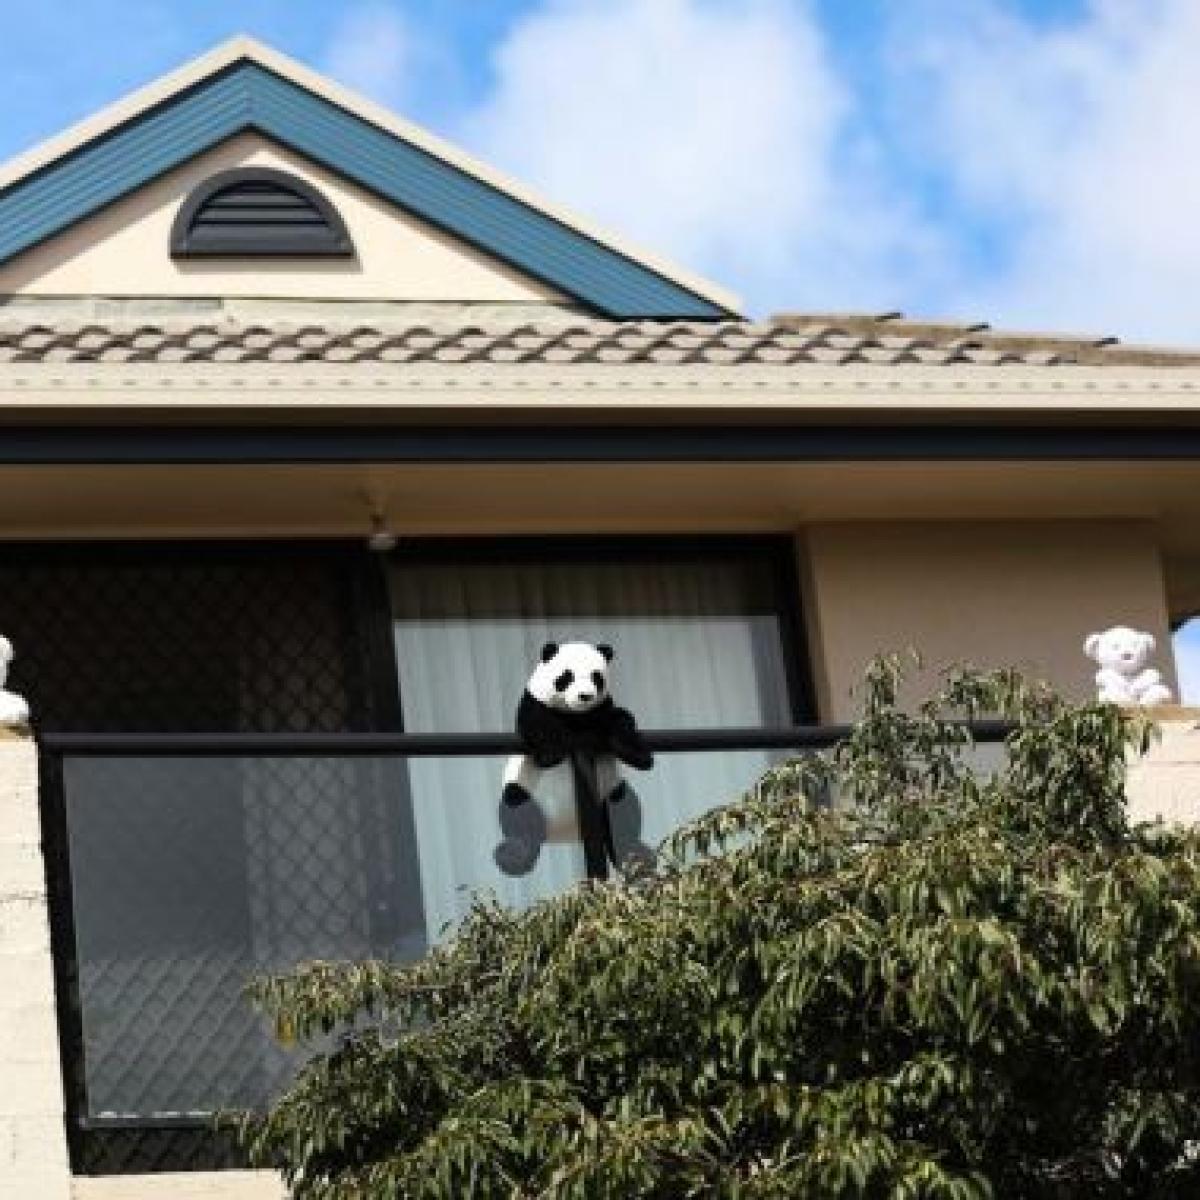 How people are cheered in New Zealand amid coronavirus lockdown